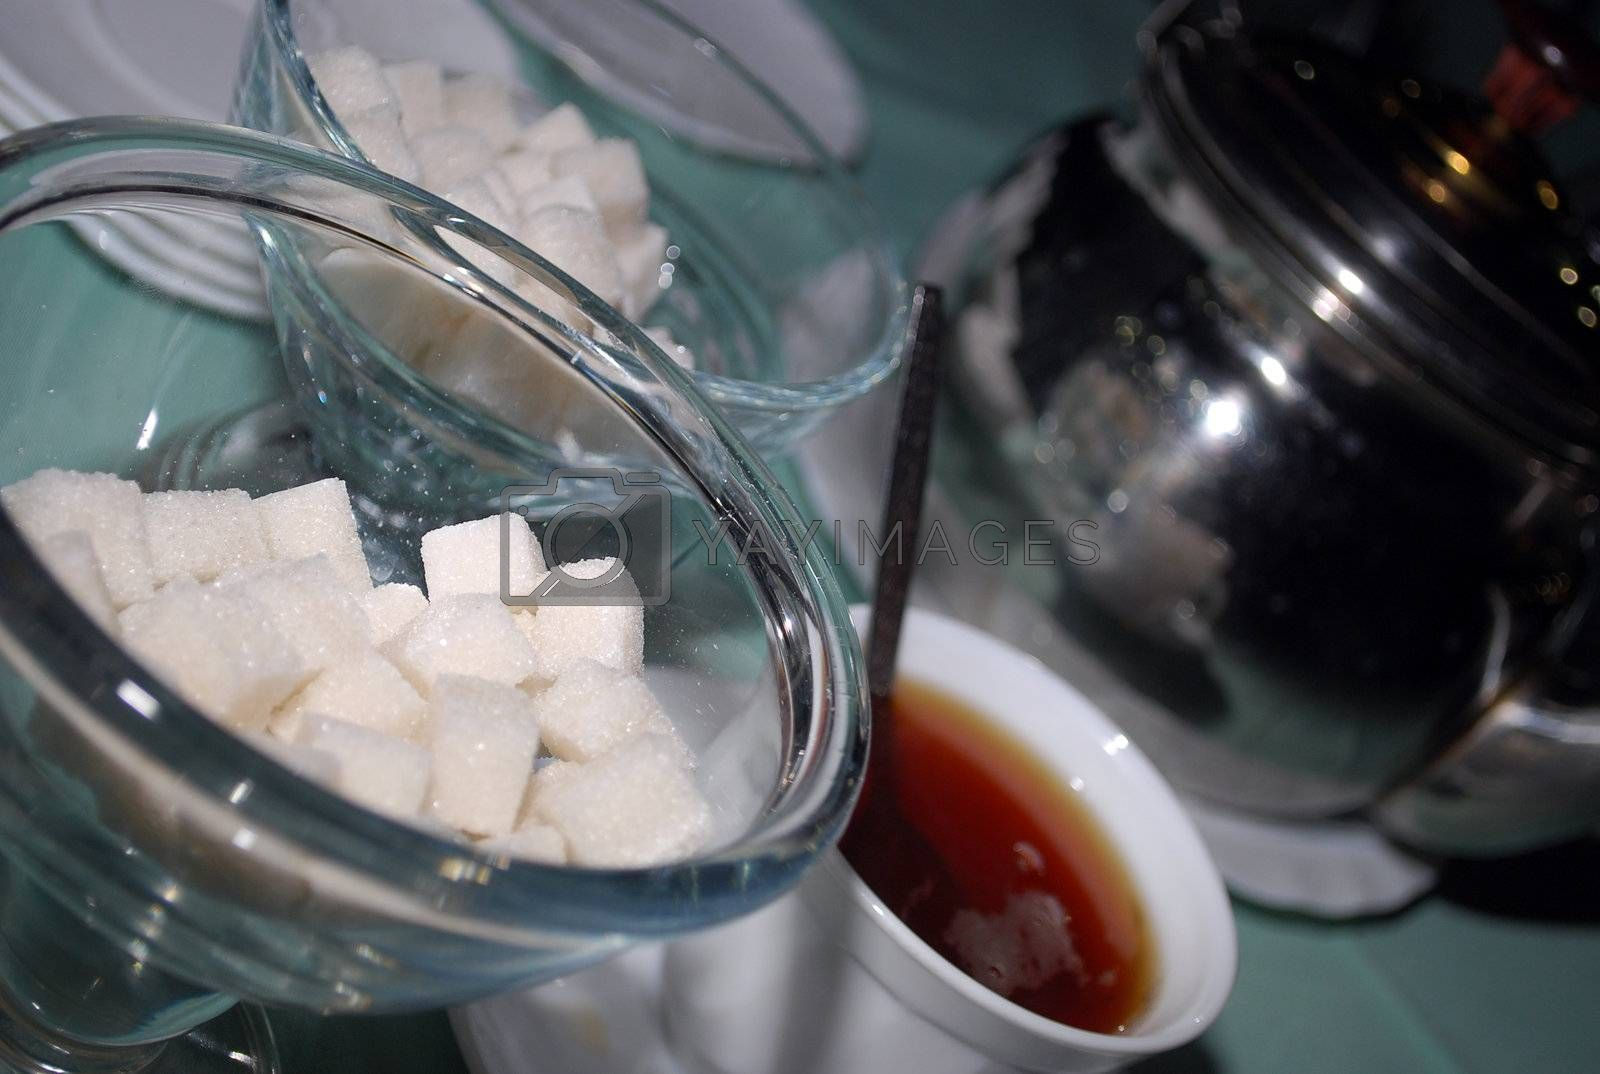 Royalty free image of sugar and tea by olegator1977